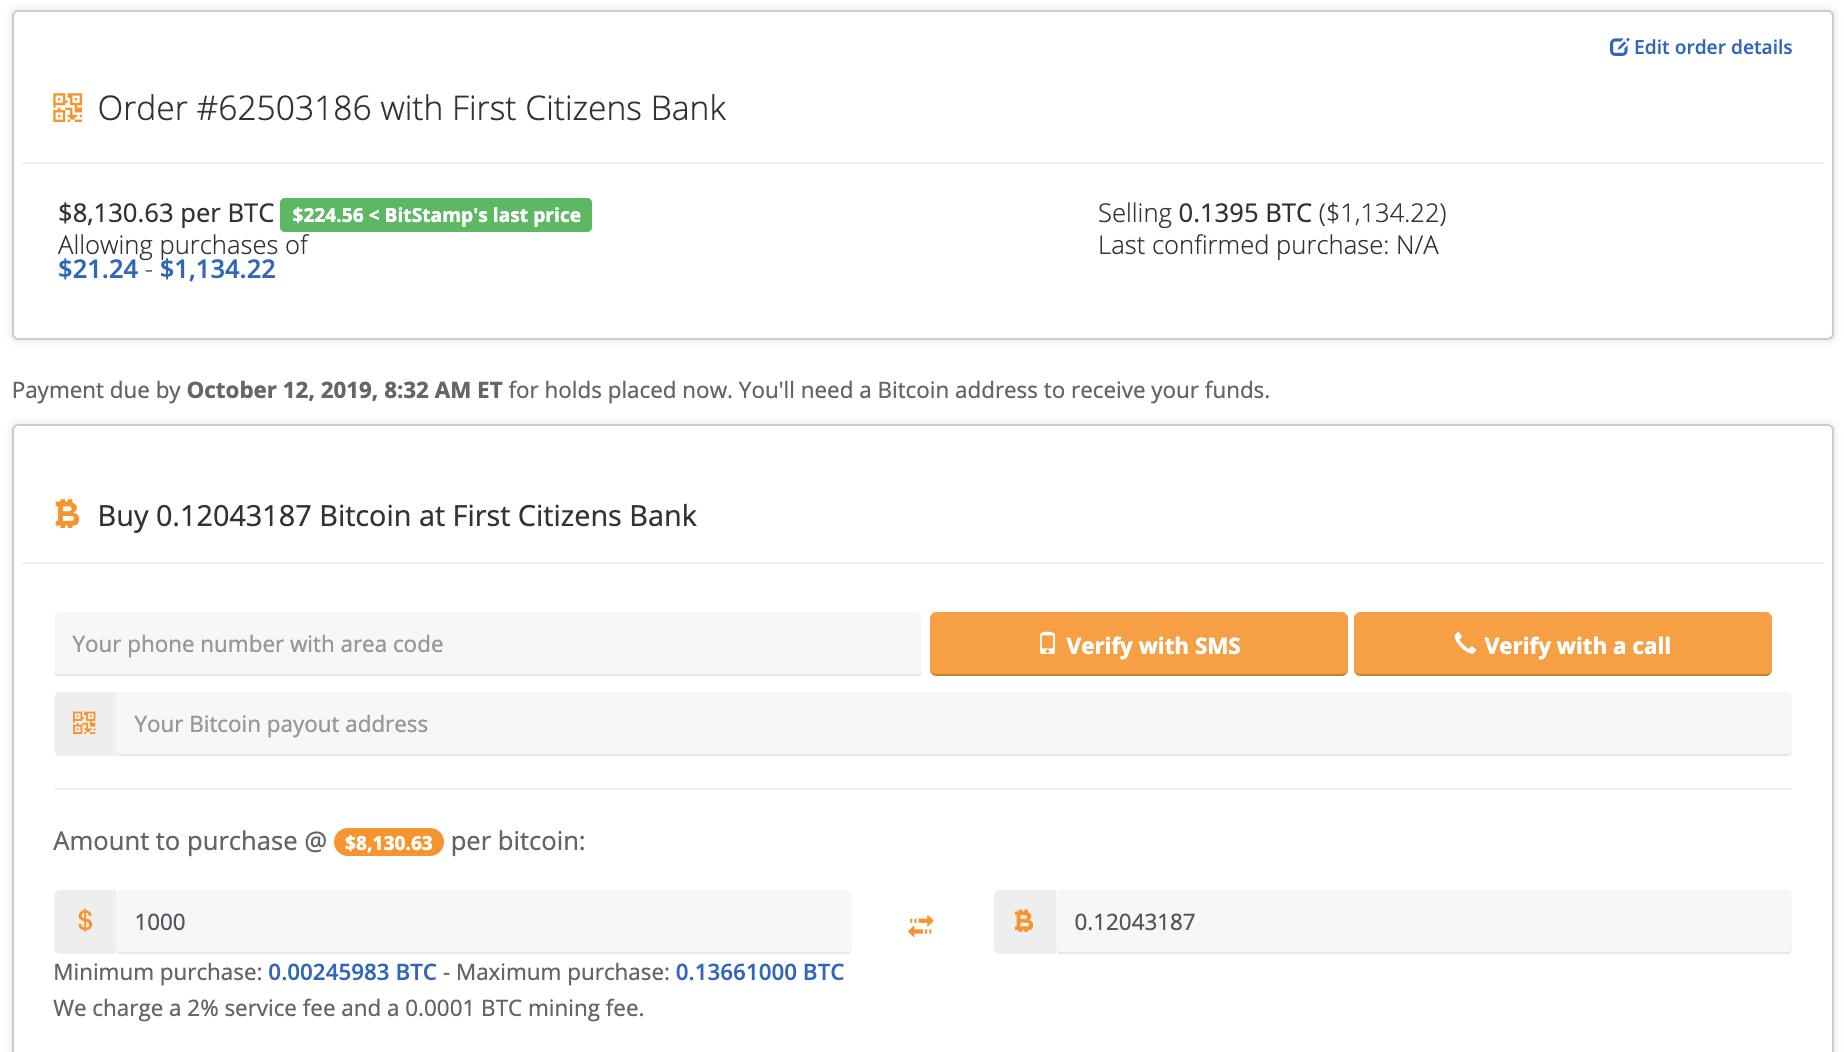 nopirkt bitcoin par zemu cenu